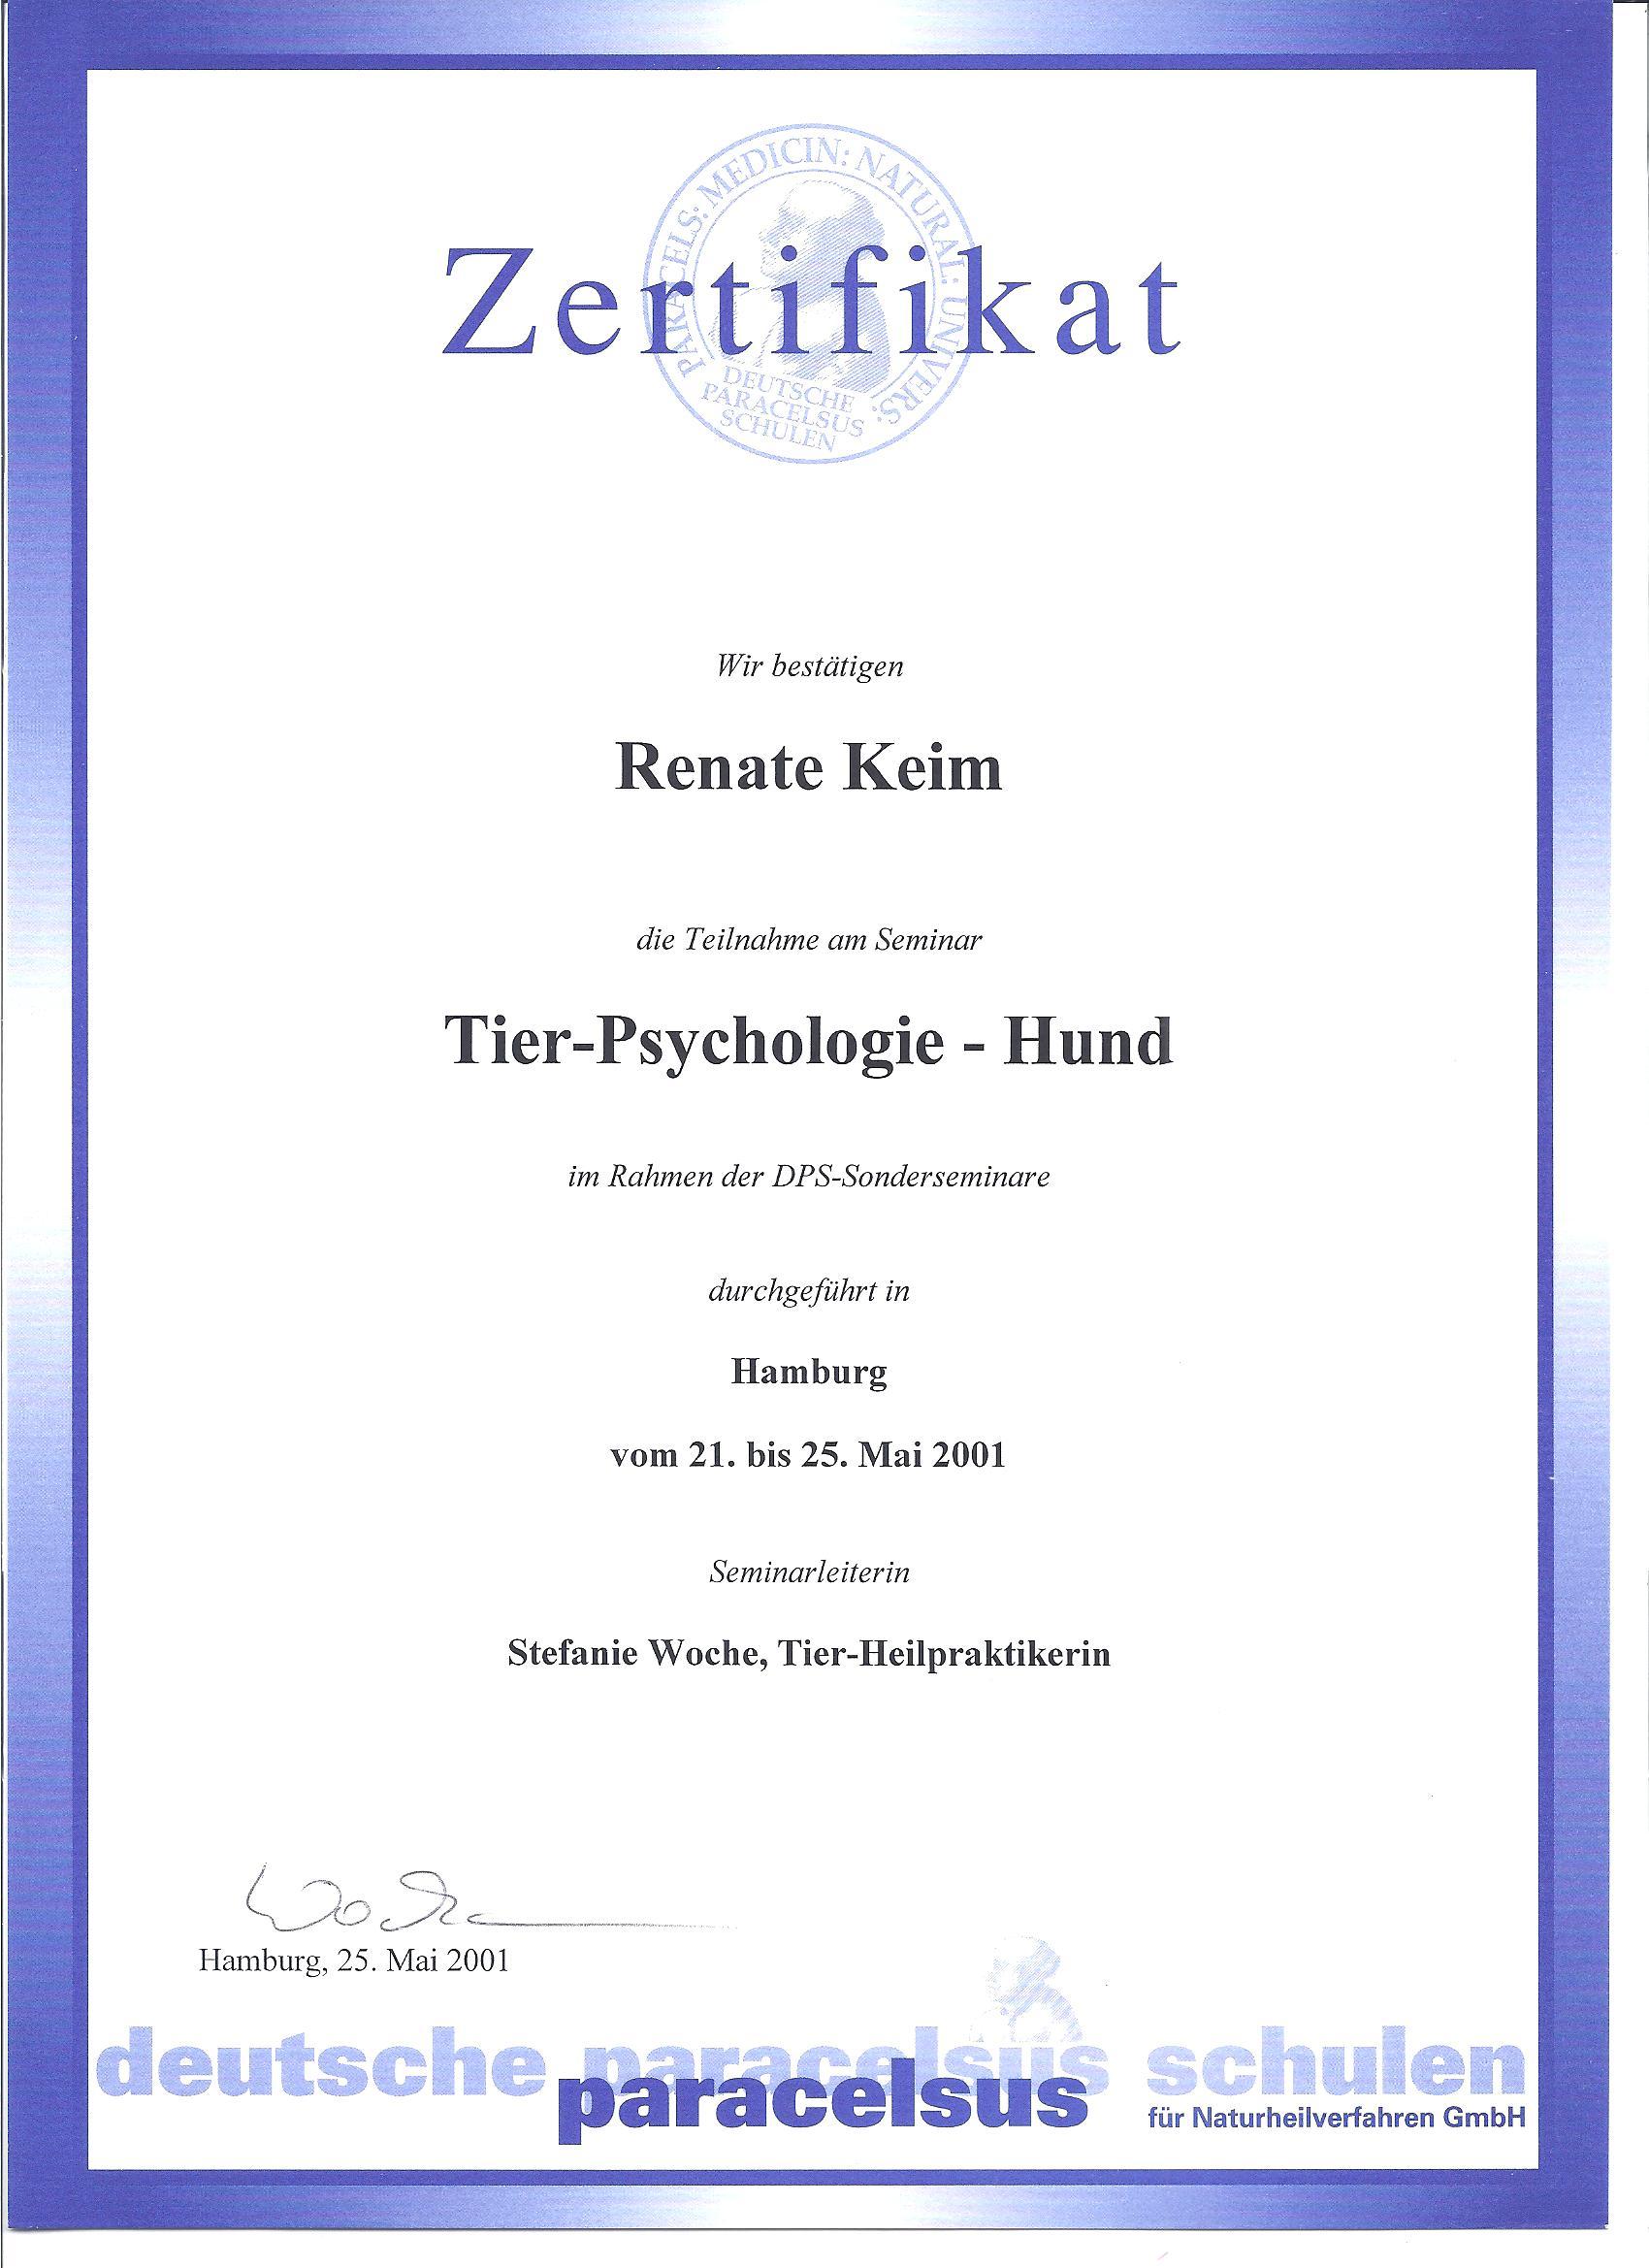 Tier-Psychologie - Hund 05/01